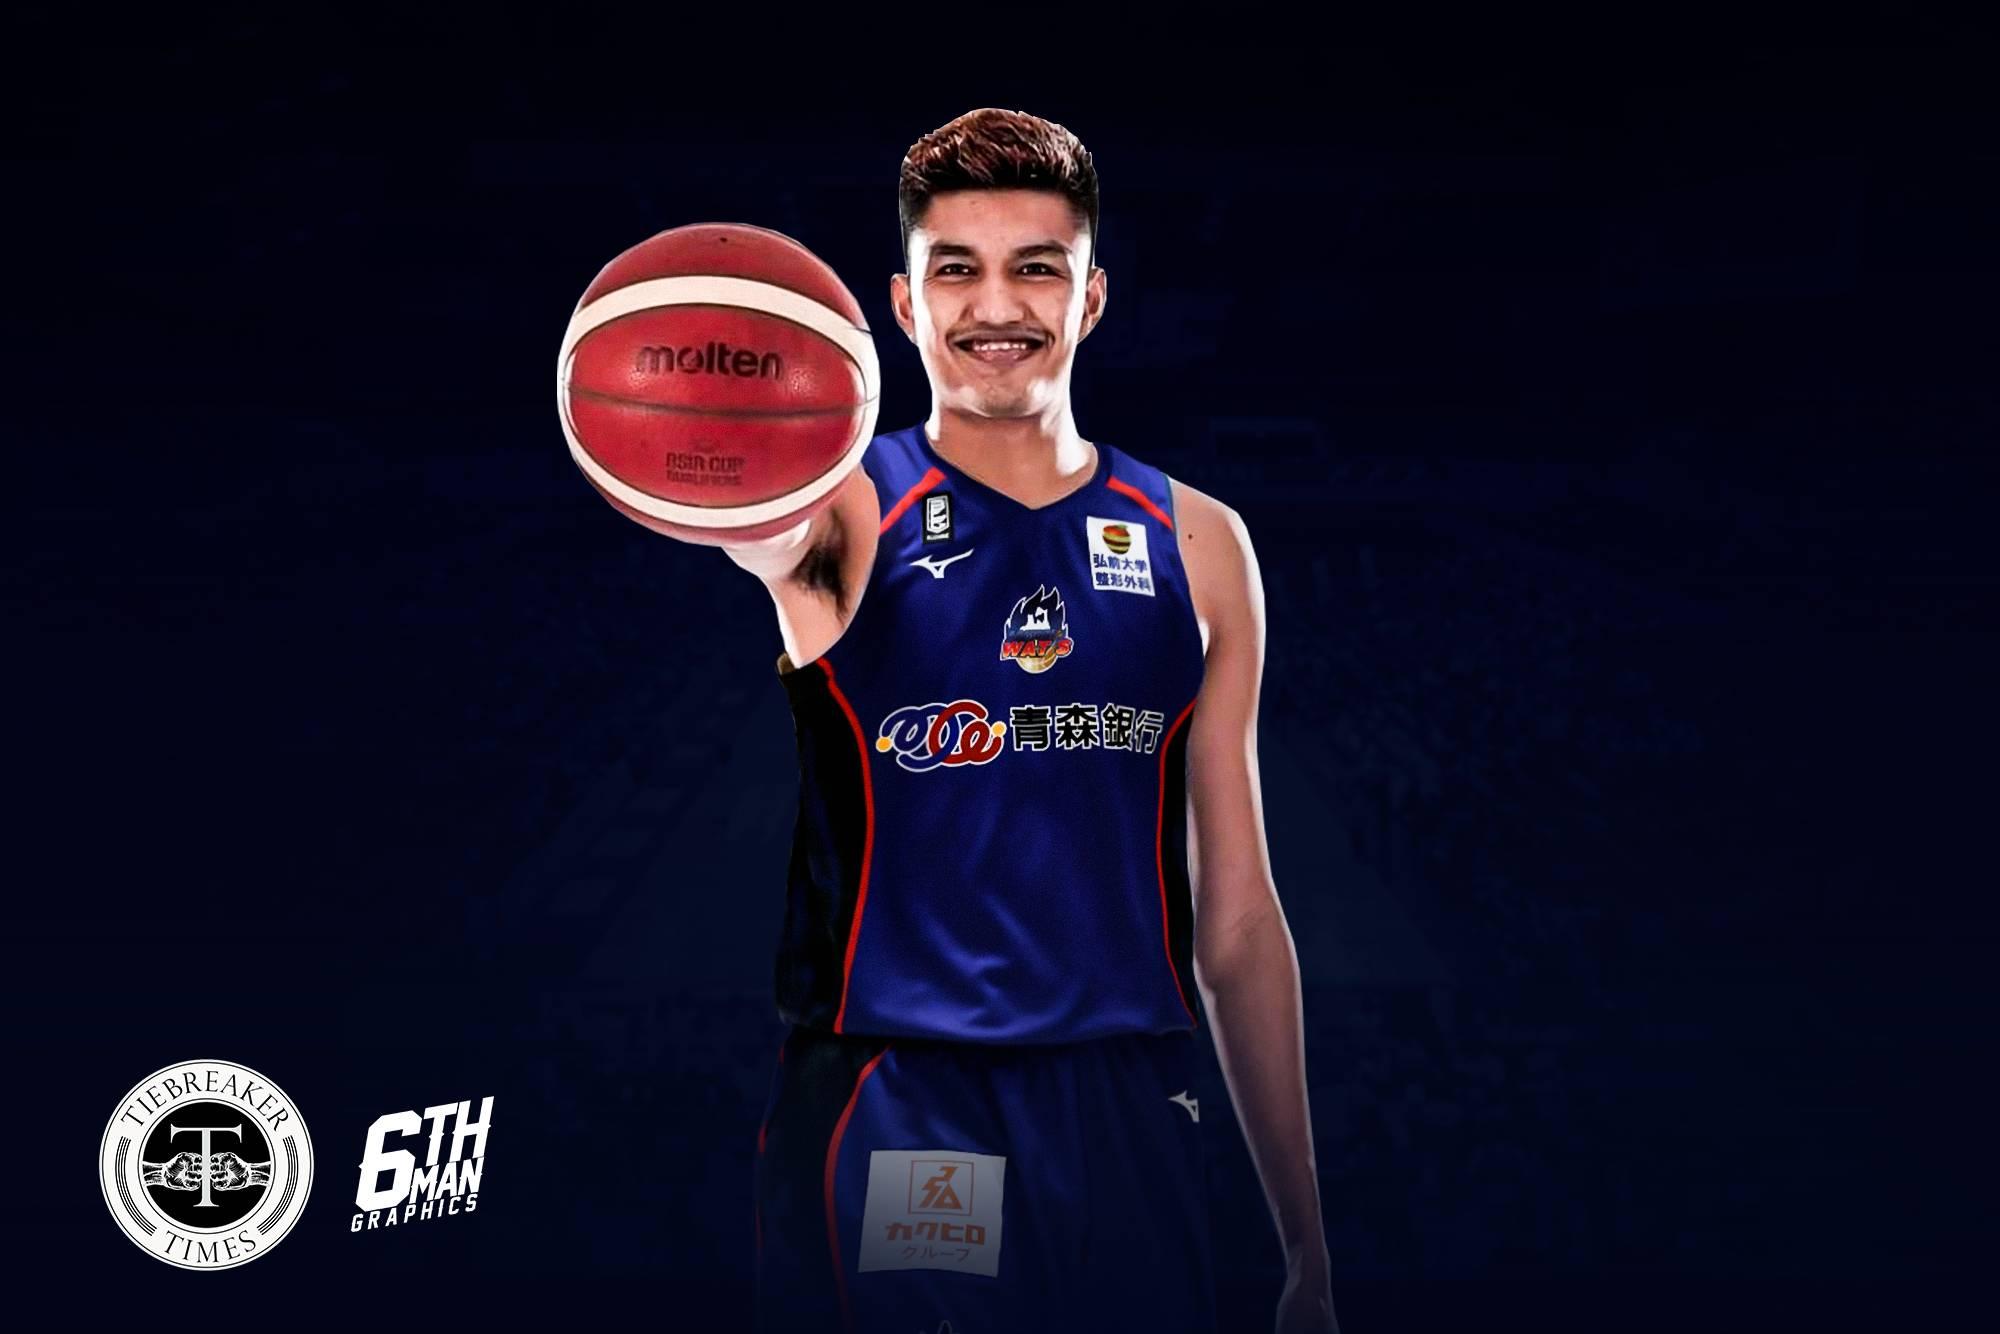 2021-22-B.League-Season-Aomori-Wats-Kemark-Carino San Beda's Roque understands Carino's decision to go to B.League Basketball NCAA News SBC  - philippine sports news